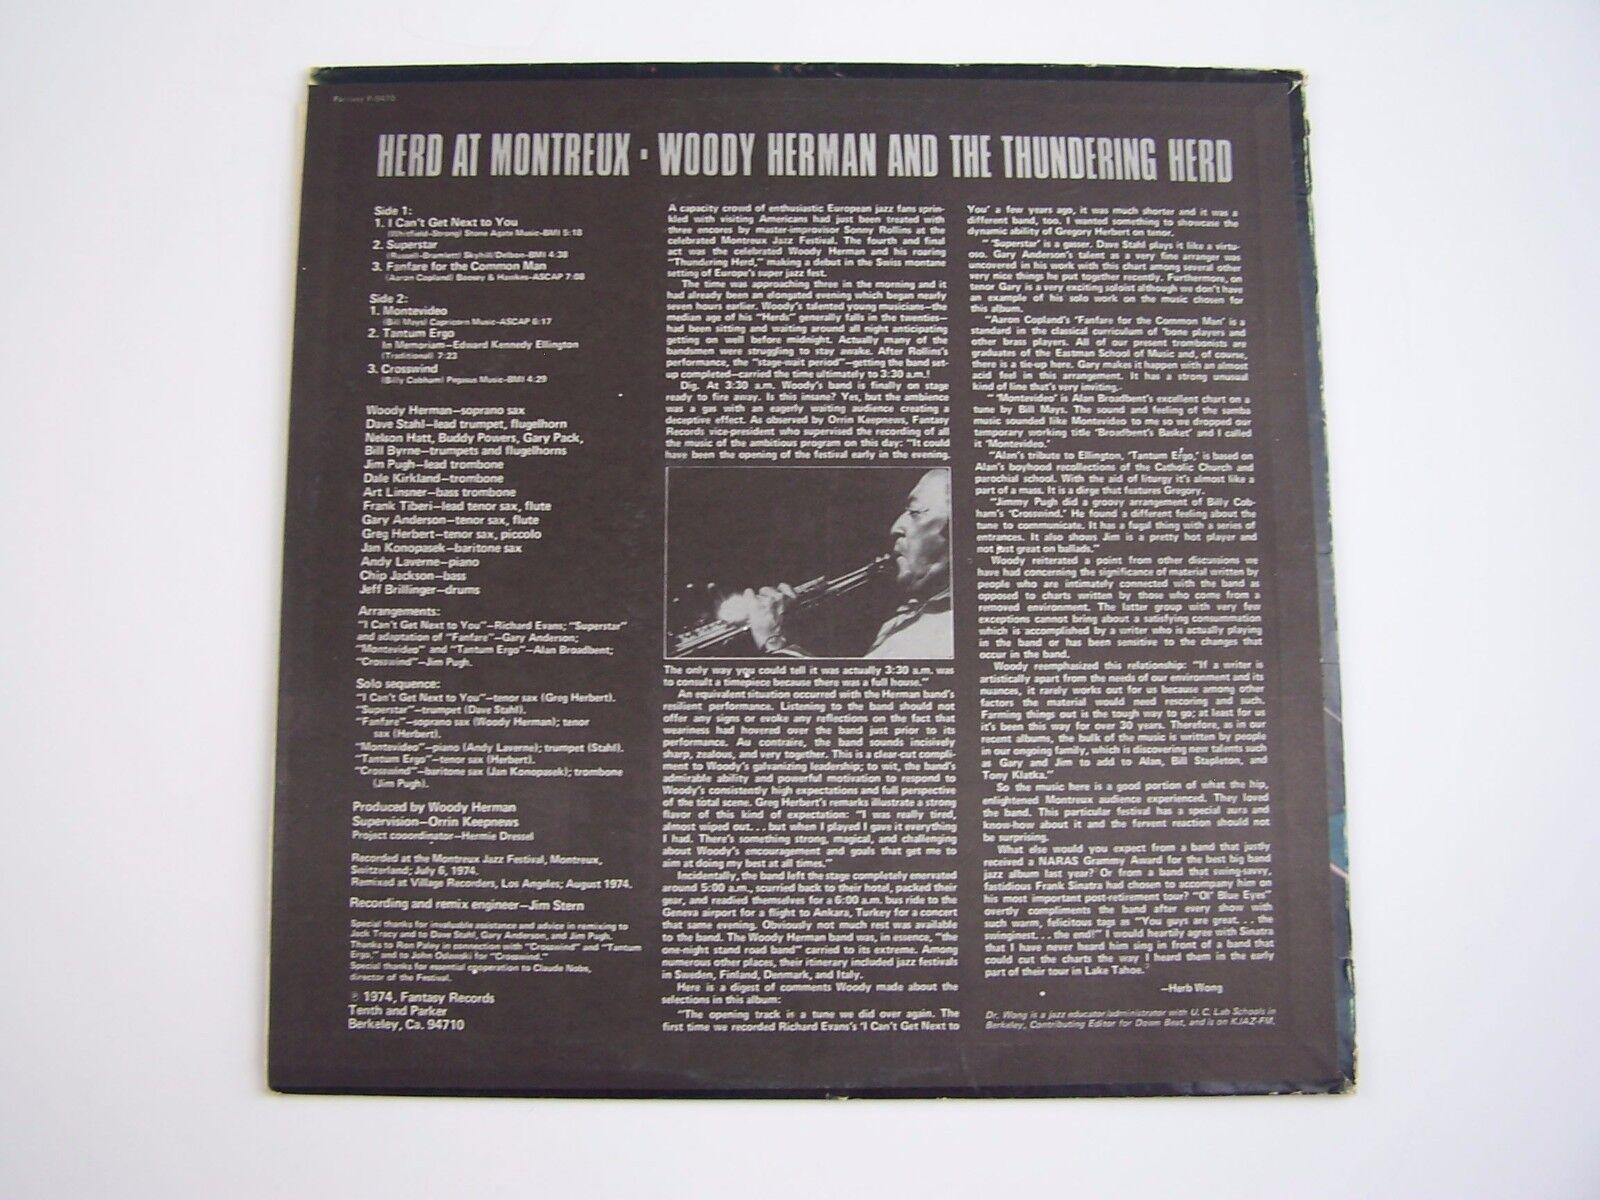 Woody Herman - Herd At Montreux Vinyl LP Record Album F